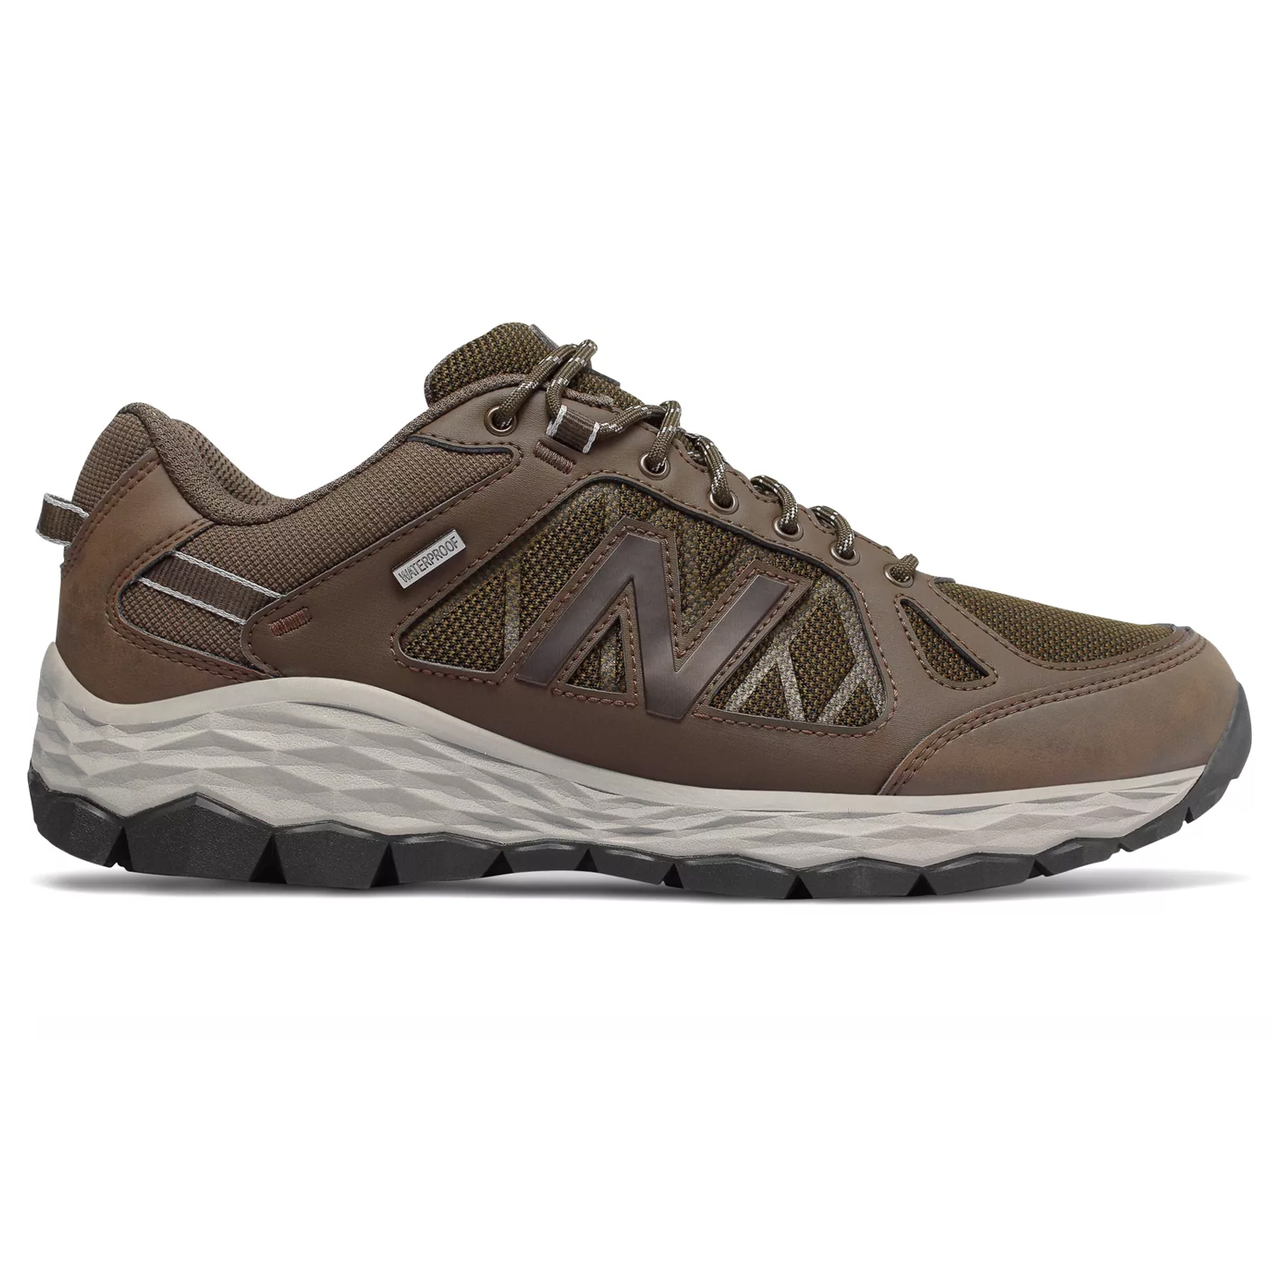 New Balance Men's 1350 Trail Walking Shoe